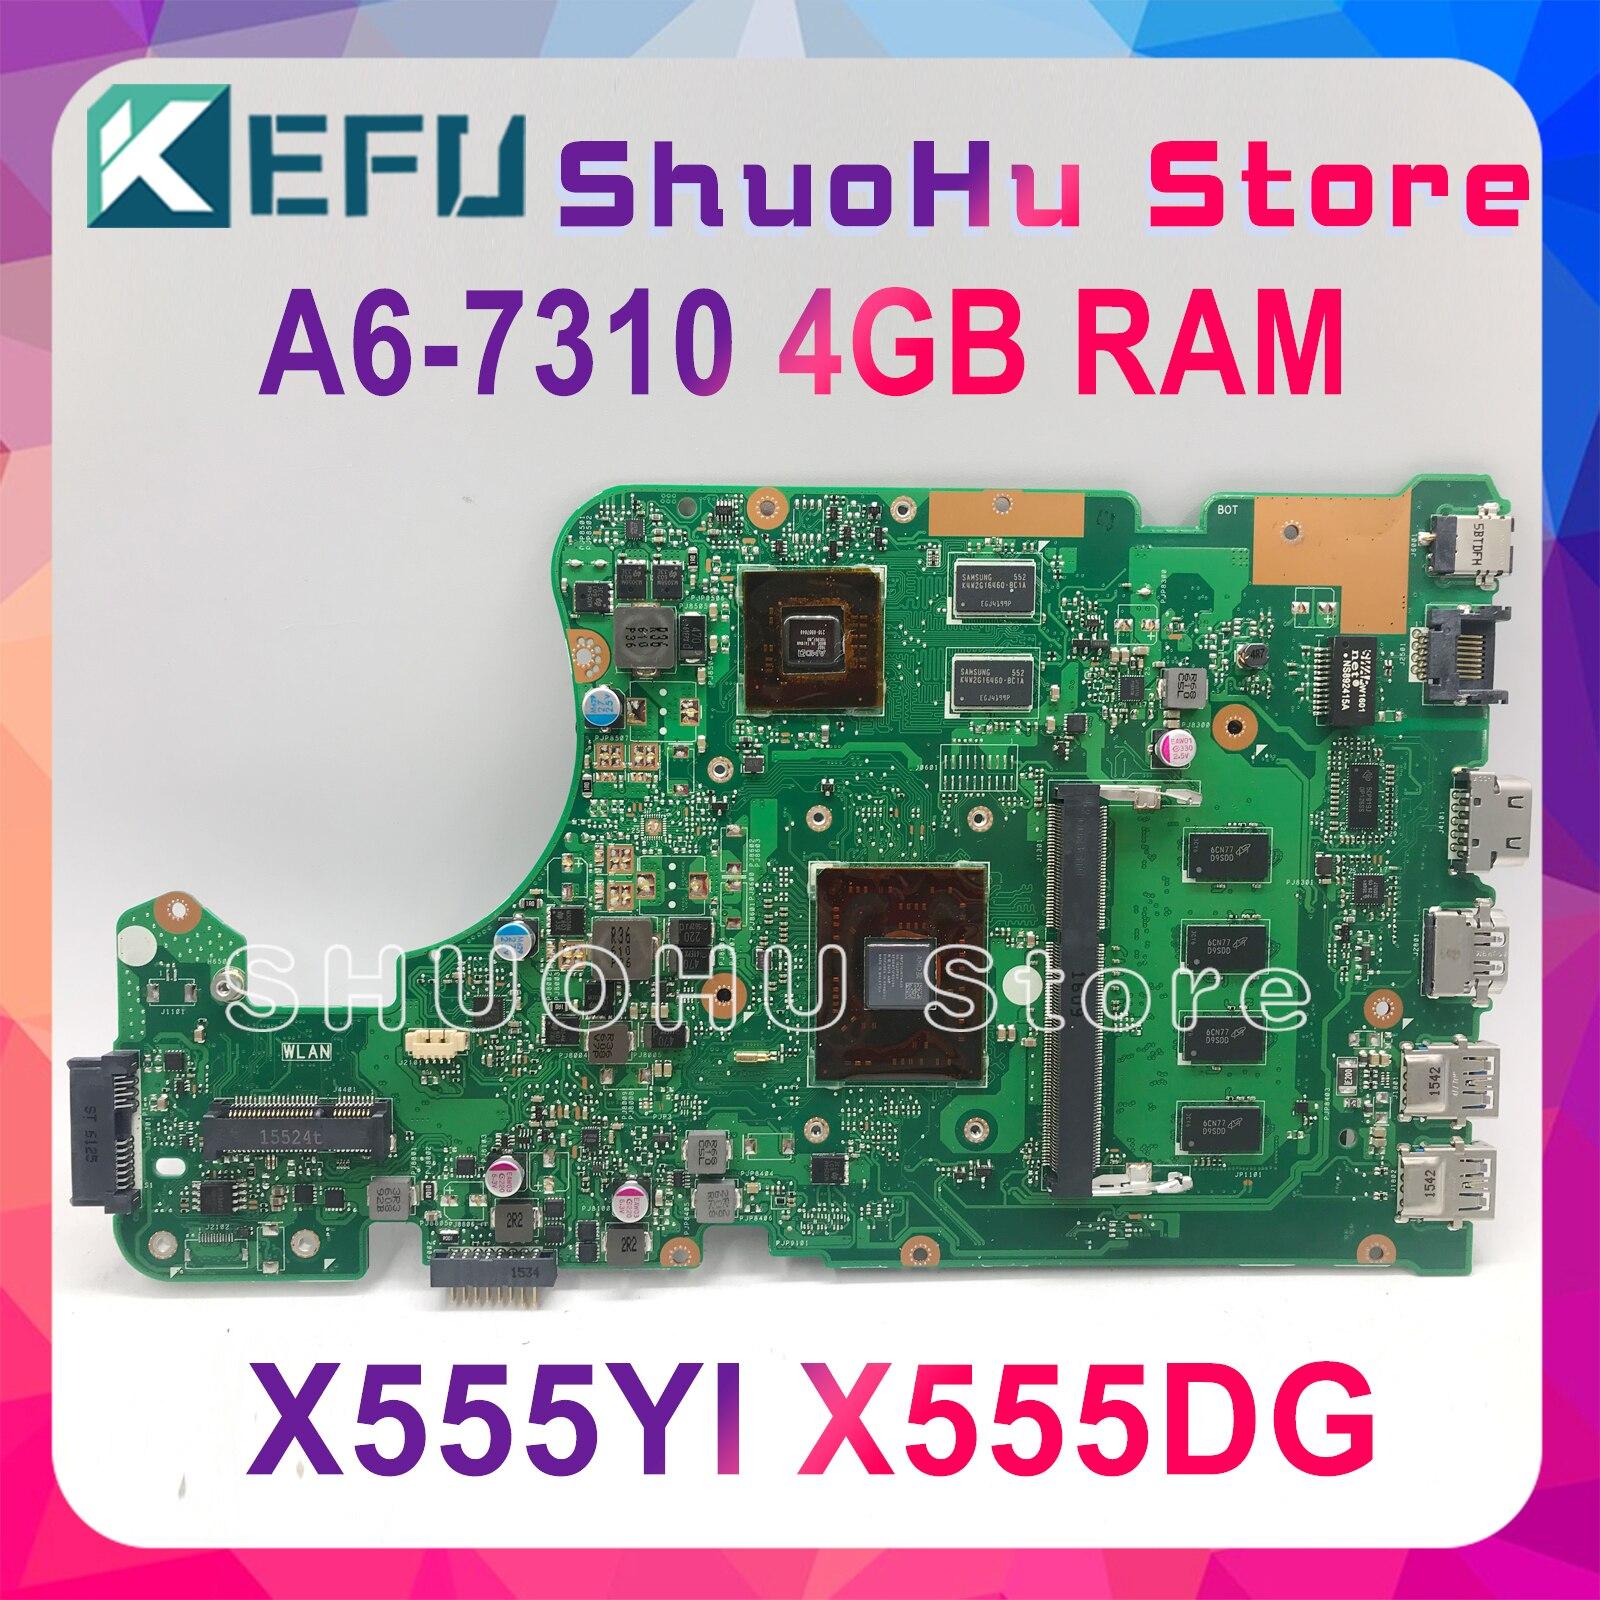 KEFU X555DG материнская плата подходит для ASUS X555DG A555DG X555QG X555YI материнская плата для ноутбука A6-7310 R5-M320 4 Гб тестовая работа 100%